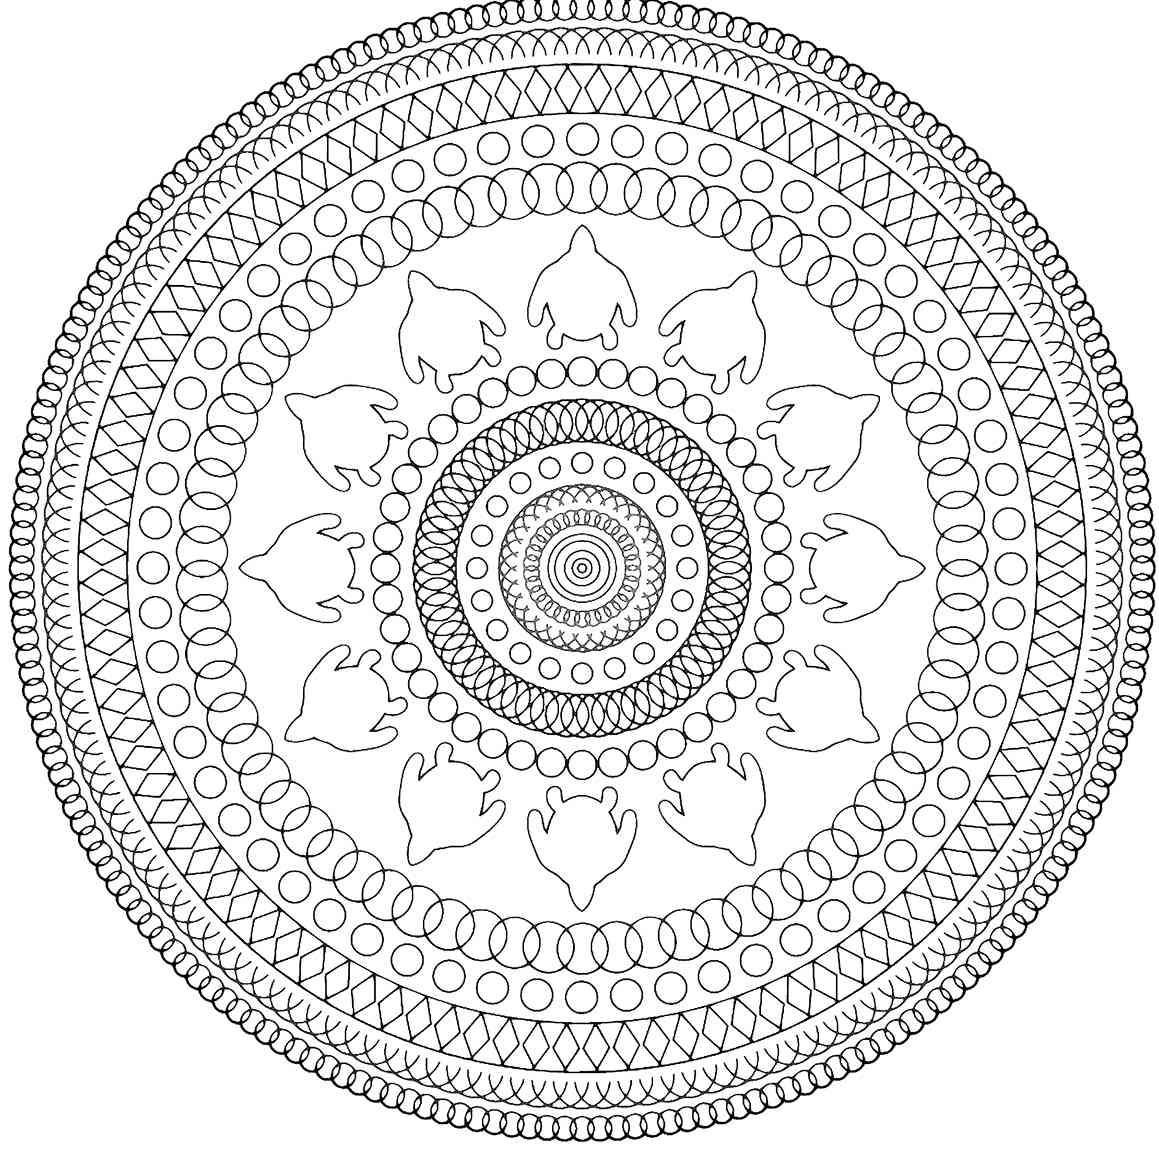 A mandala